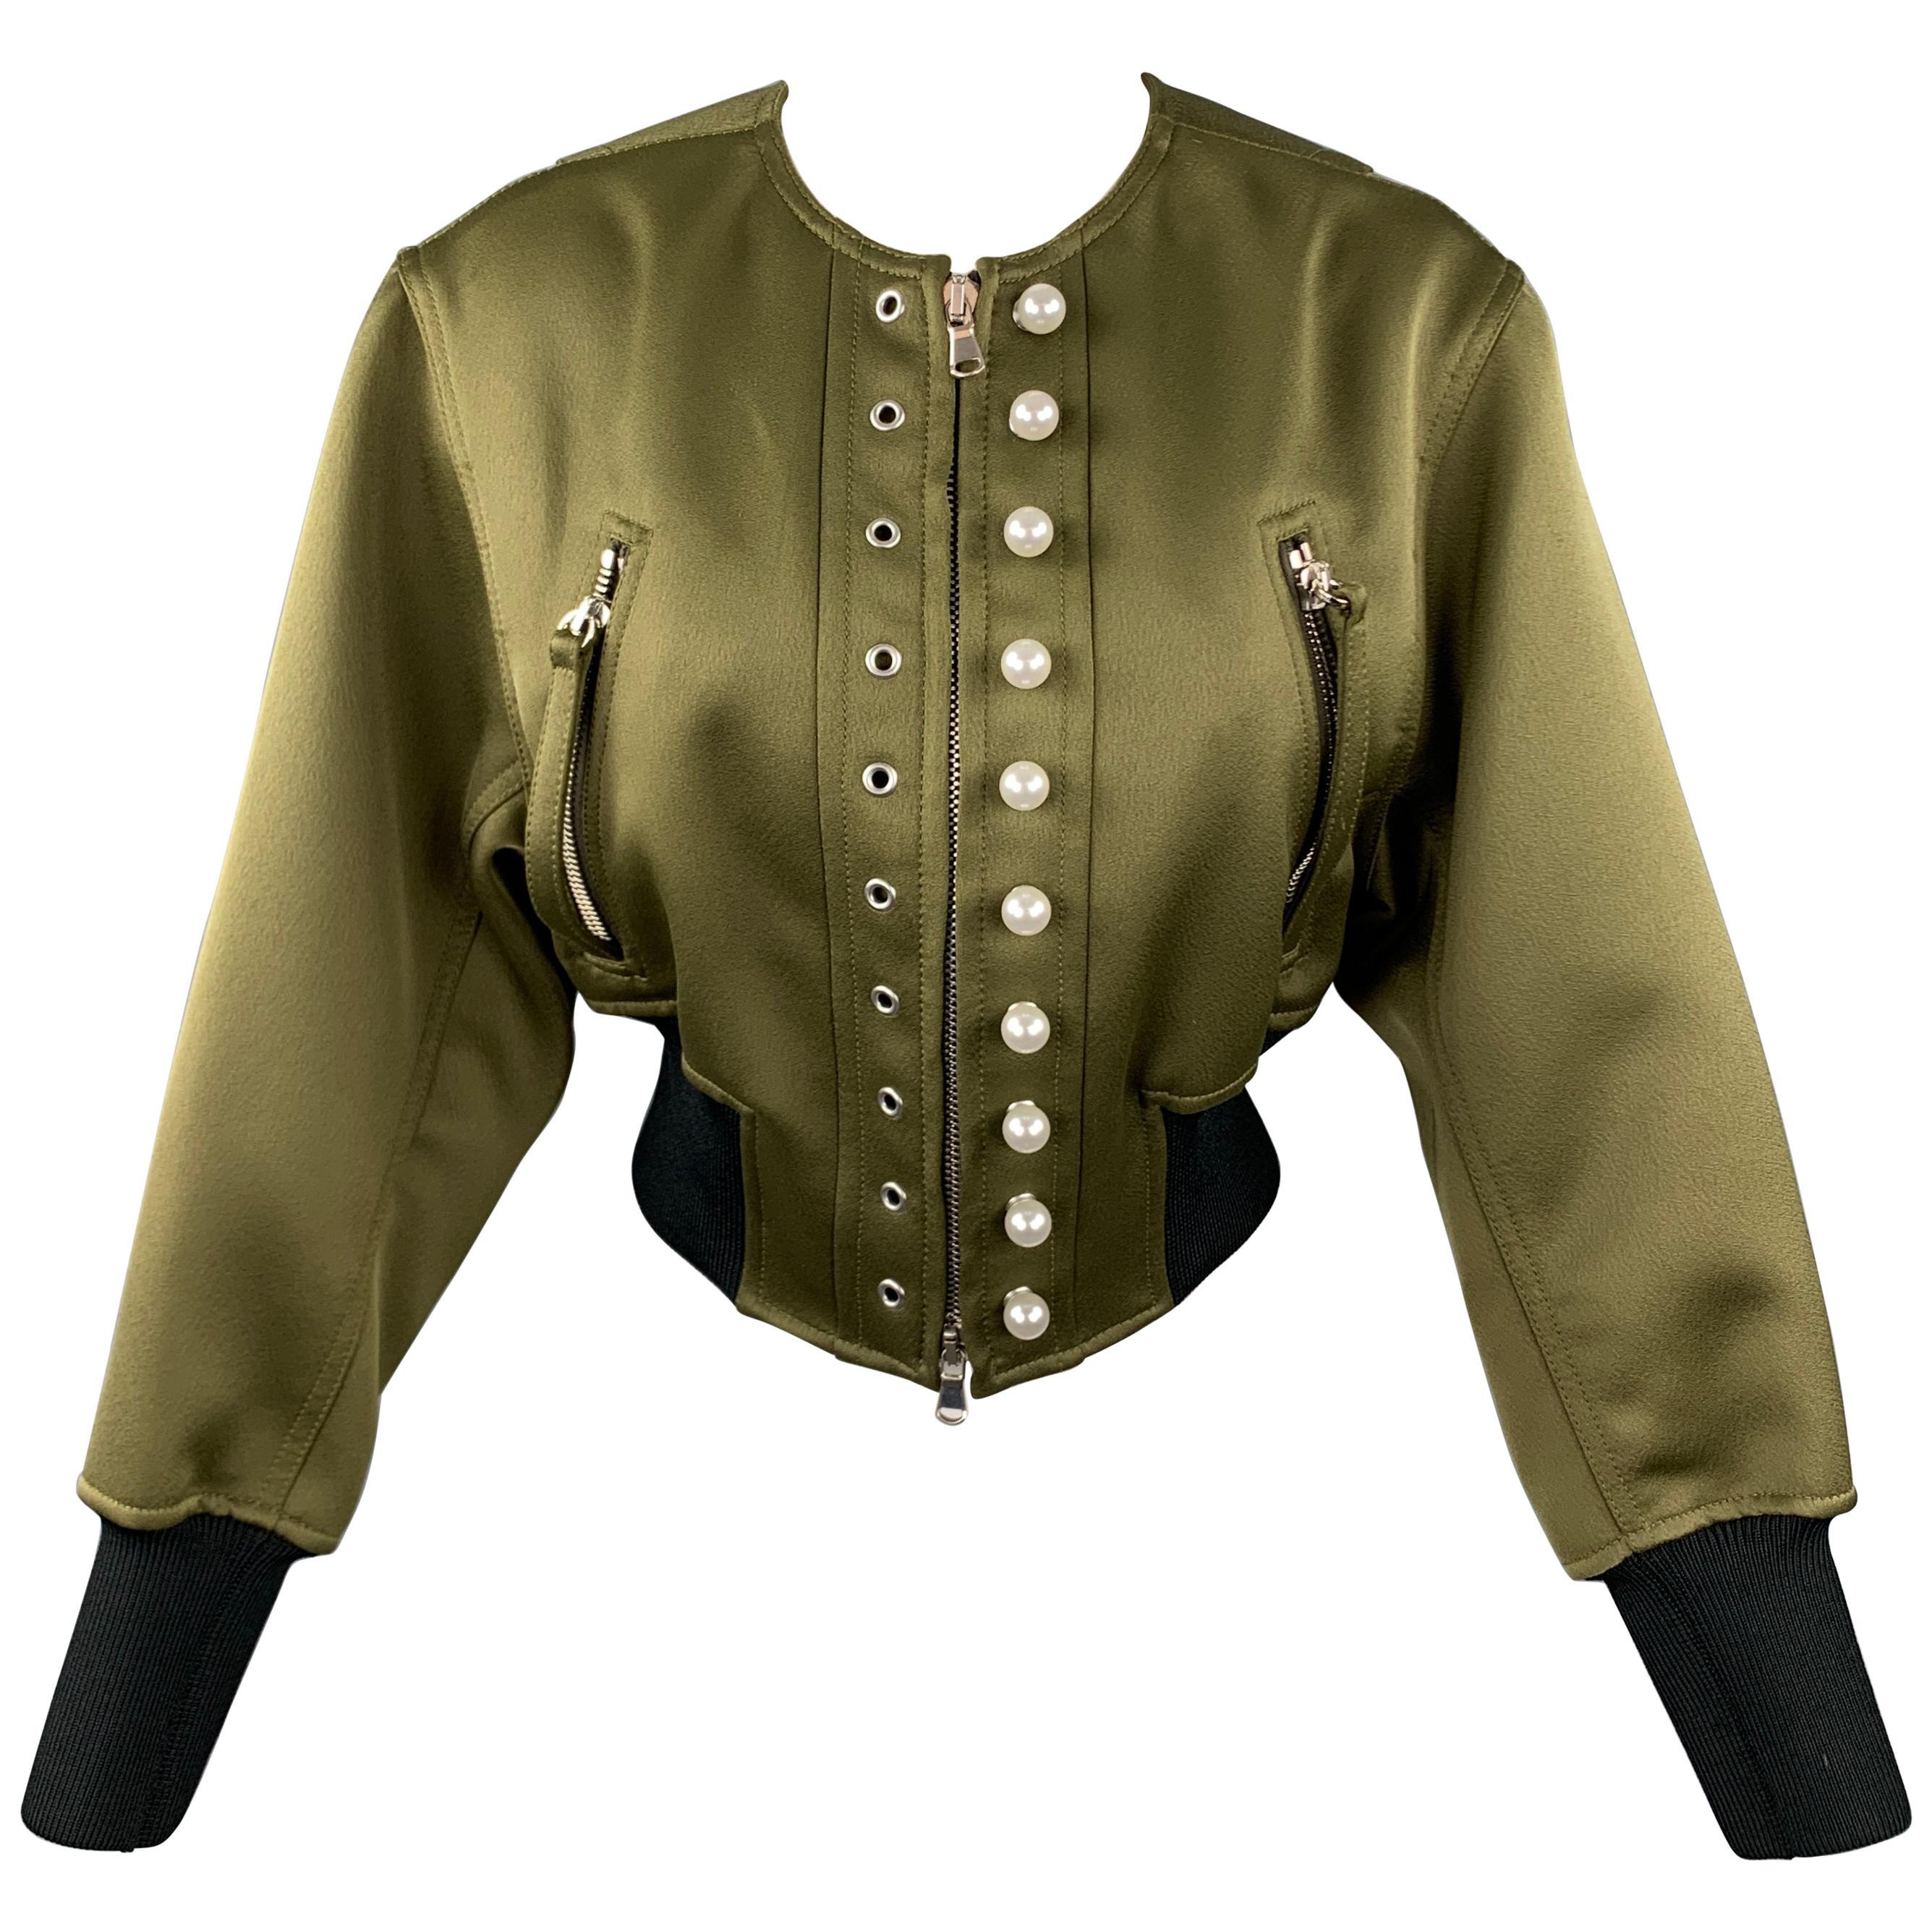 3.1 PHILLIP LIM Size 2 Olive Satin Polyester Bomber Jacket